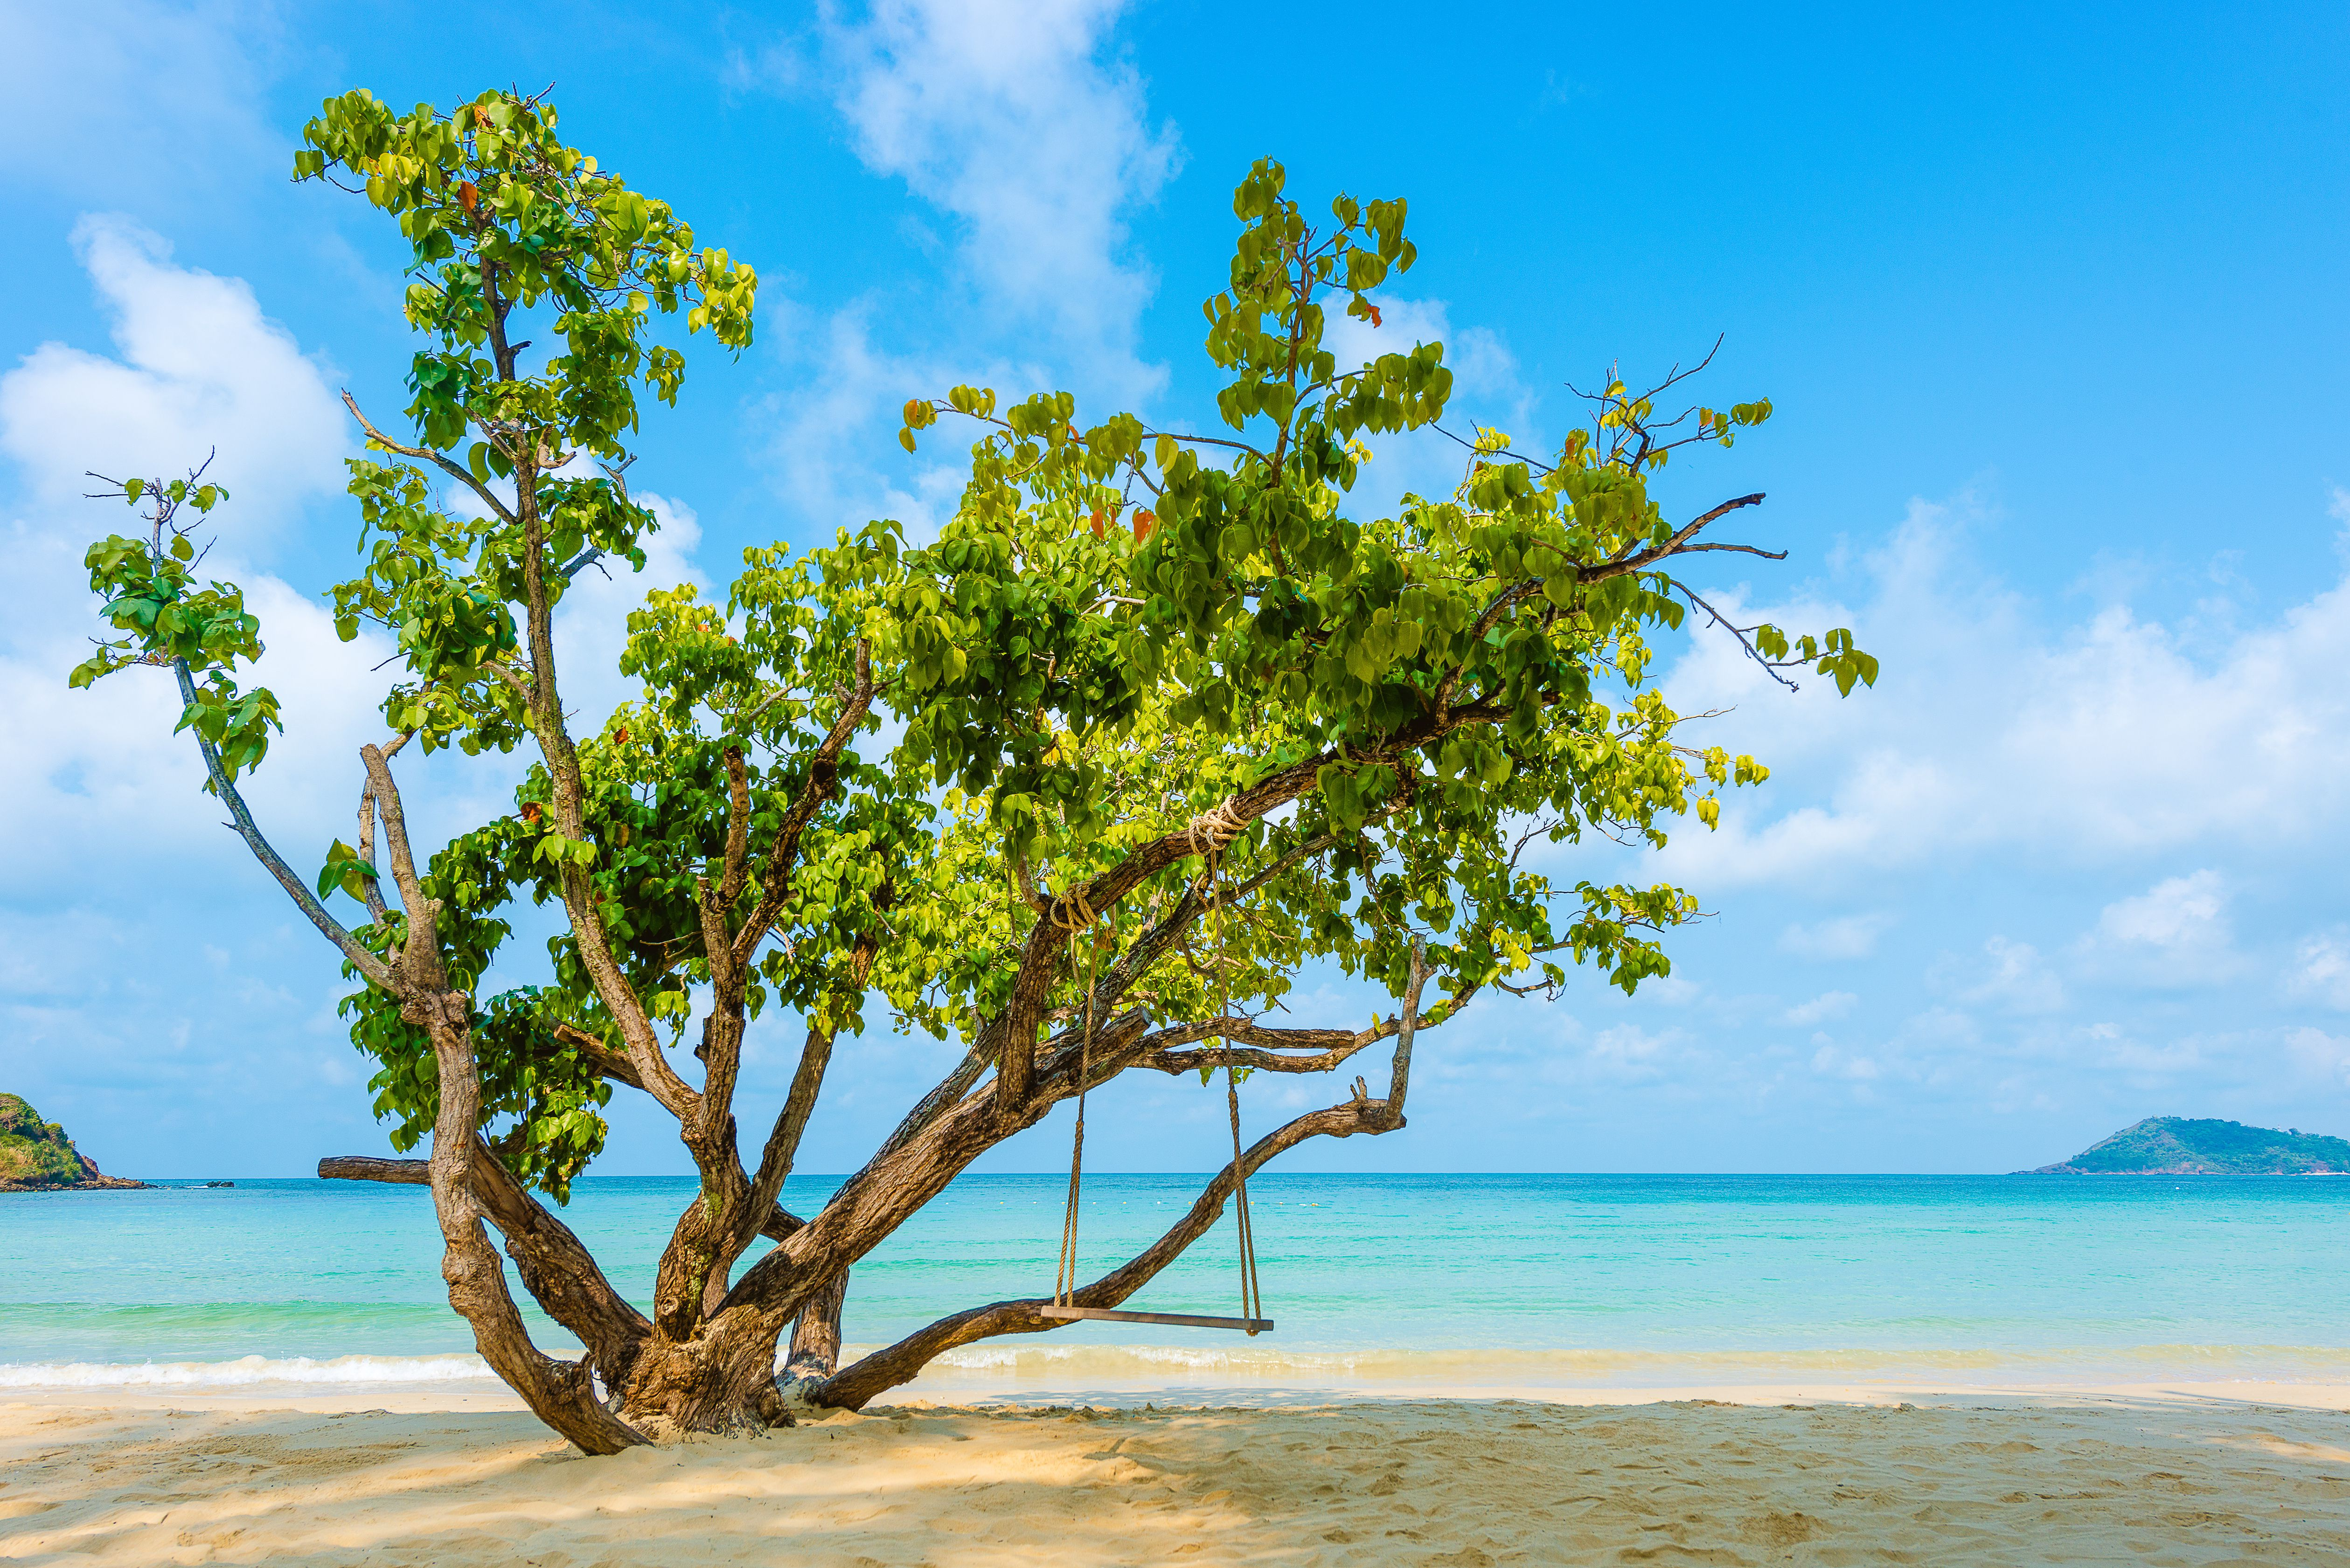 A tree on the beach in Koh Samet, Thailand